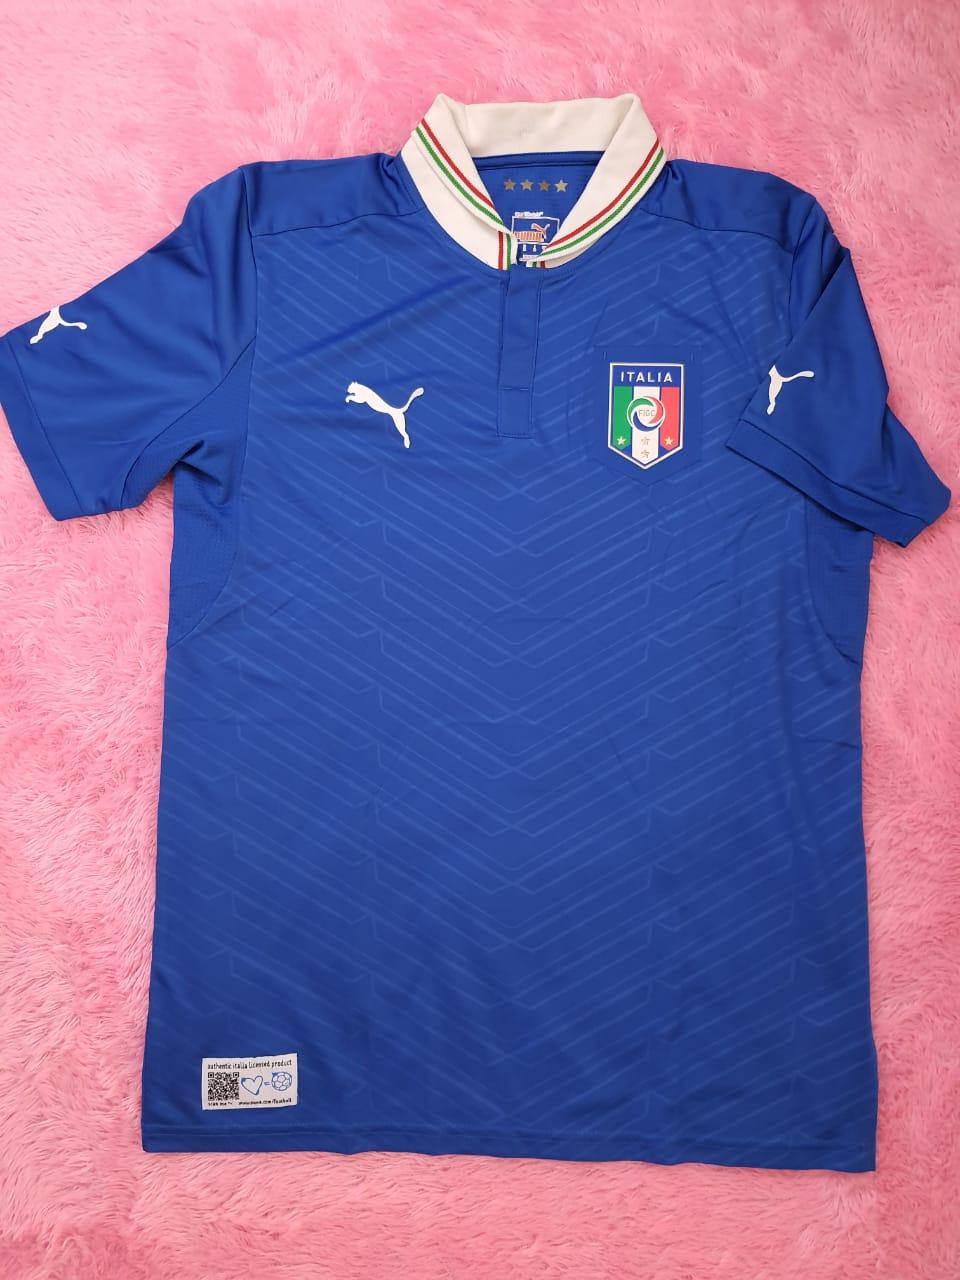 Jersey Italy Home 2012-2013 (Original)